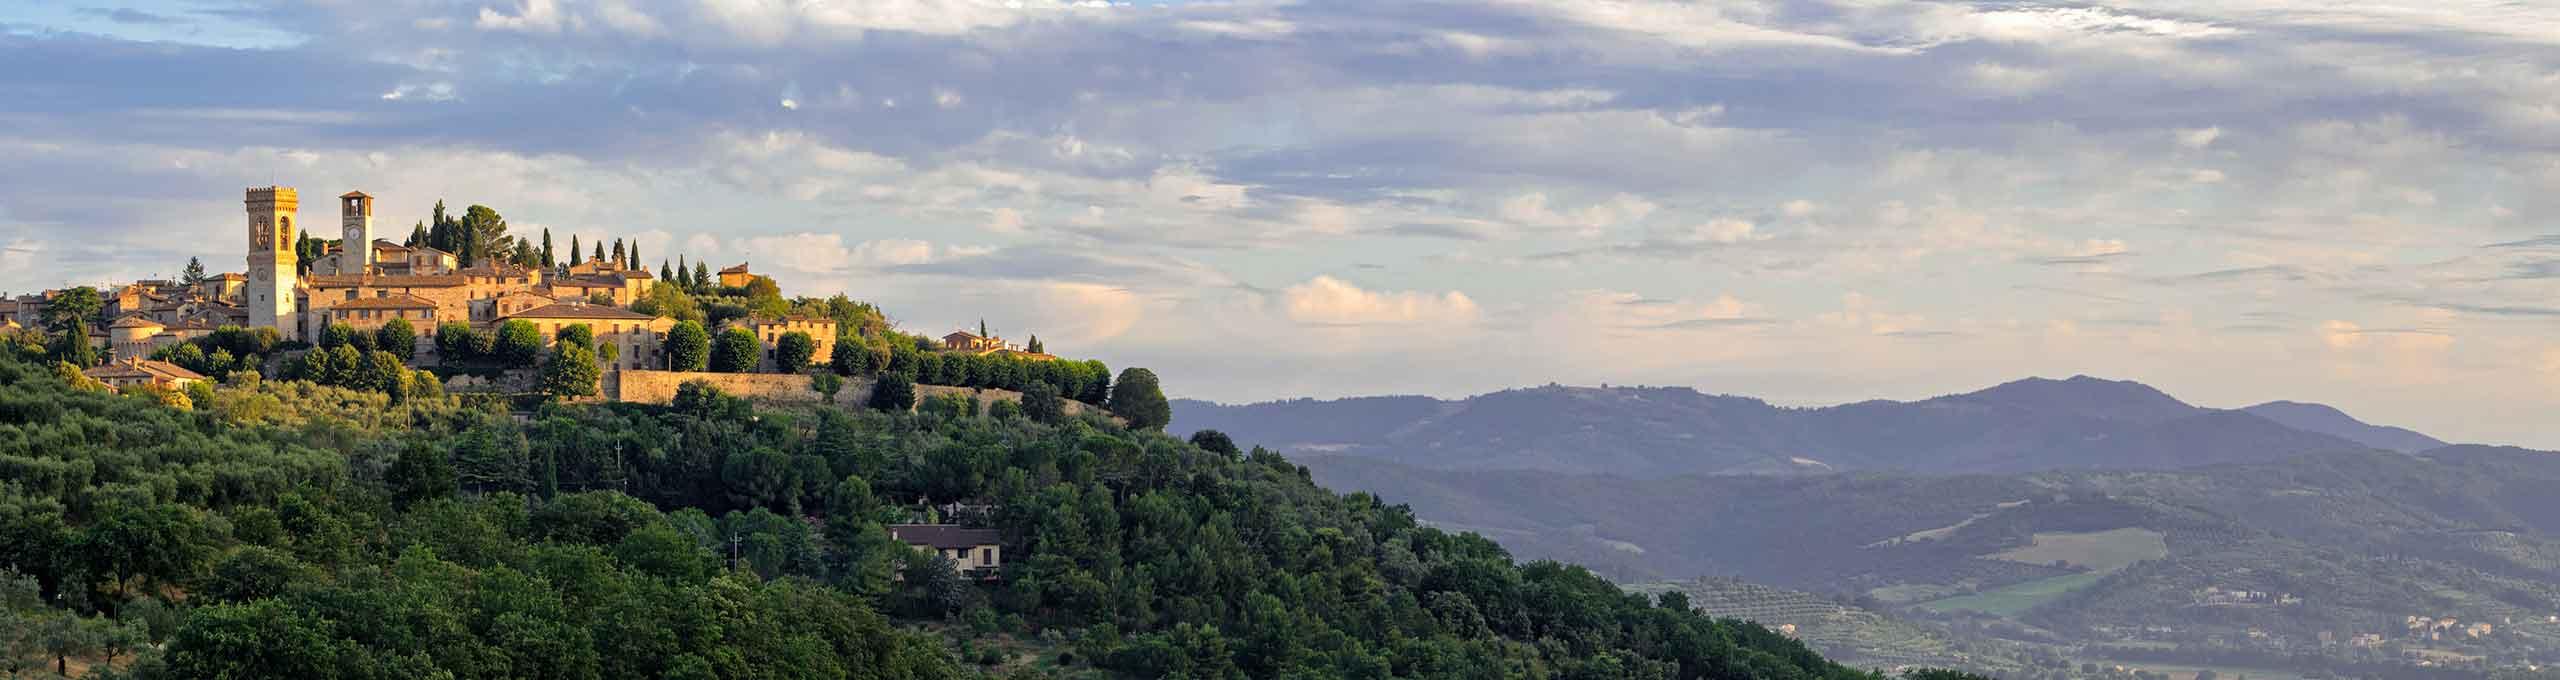 Corciano, Trasimeno, borgo medievale